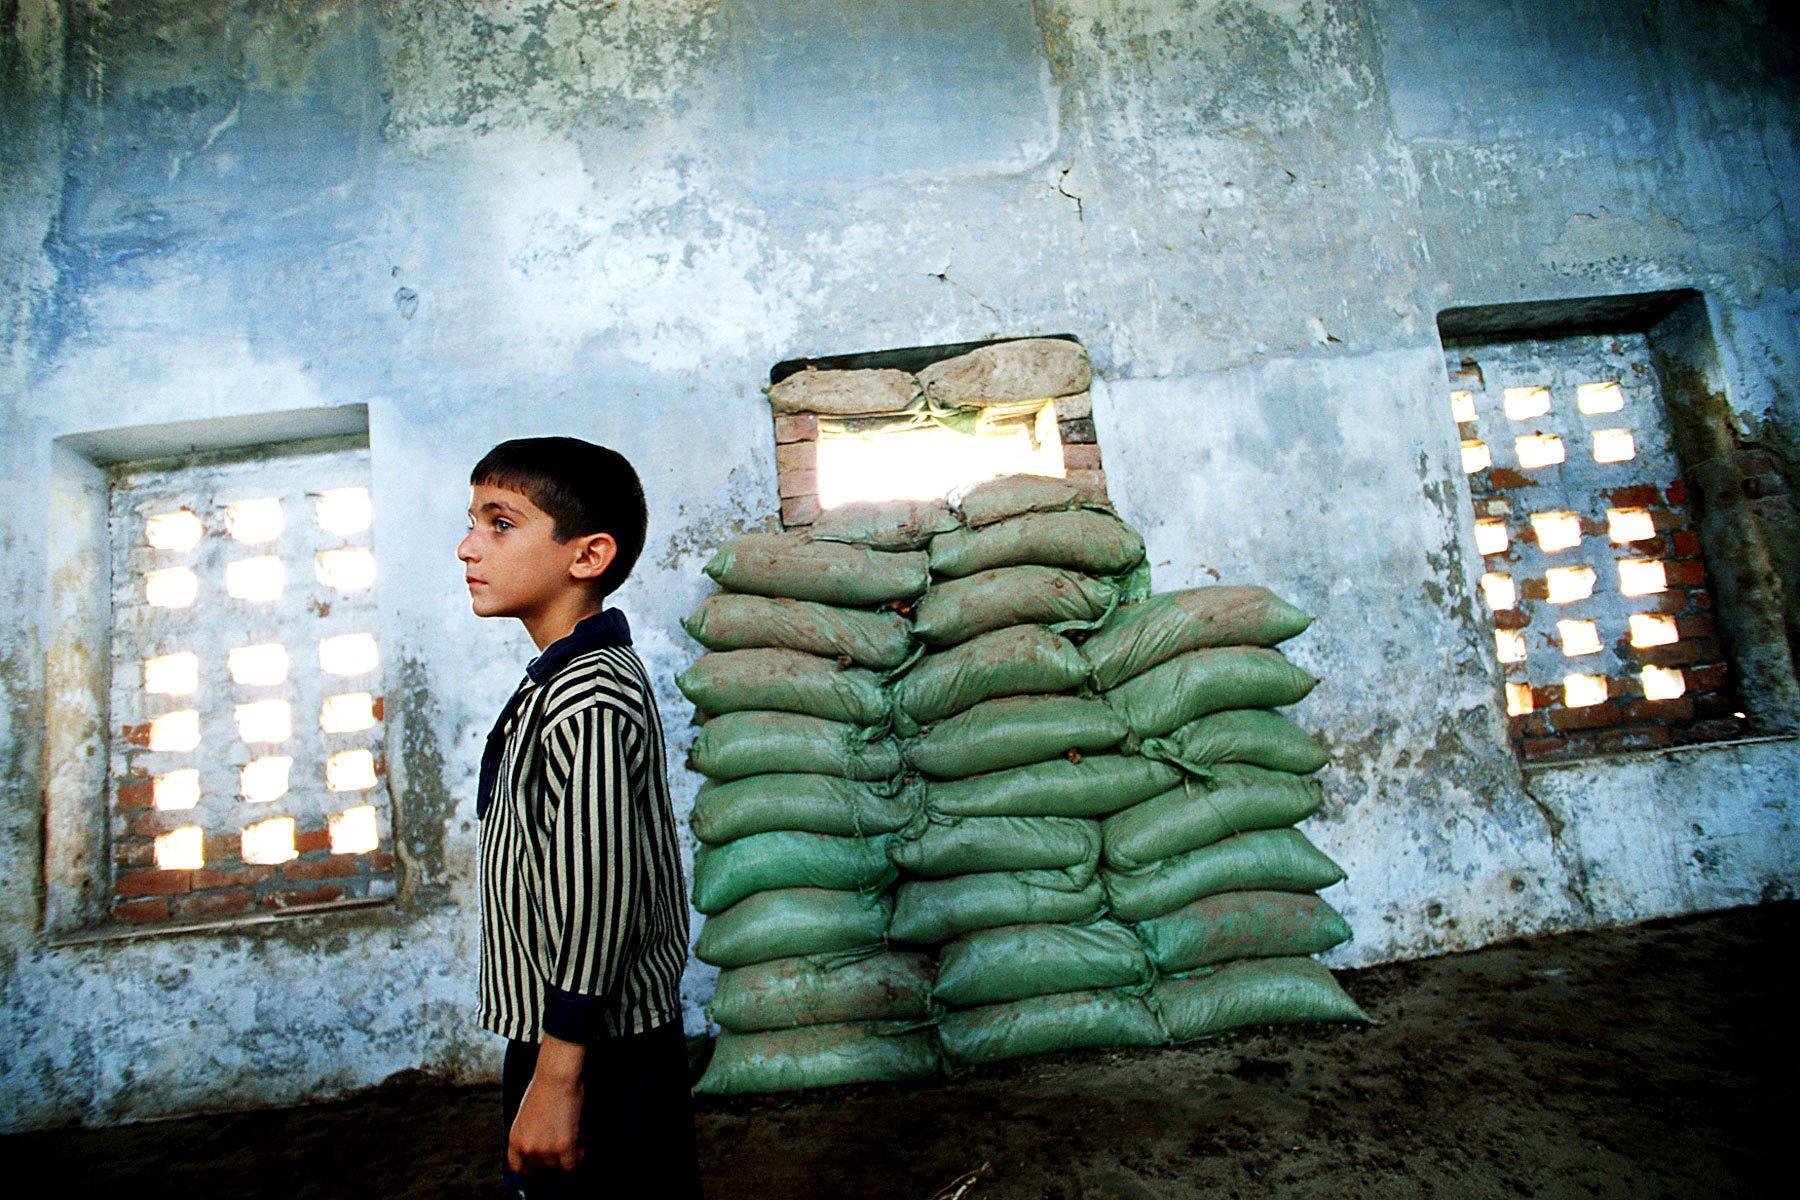 School at near Pakistan border